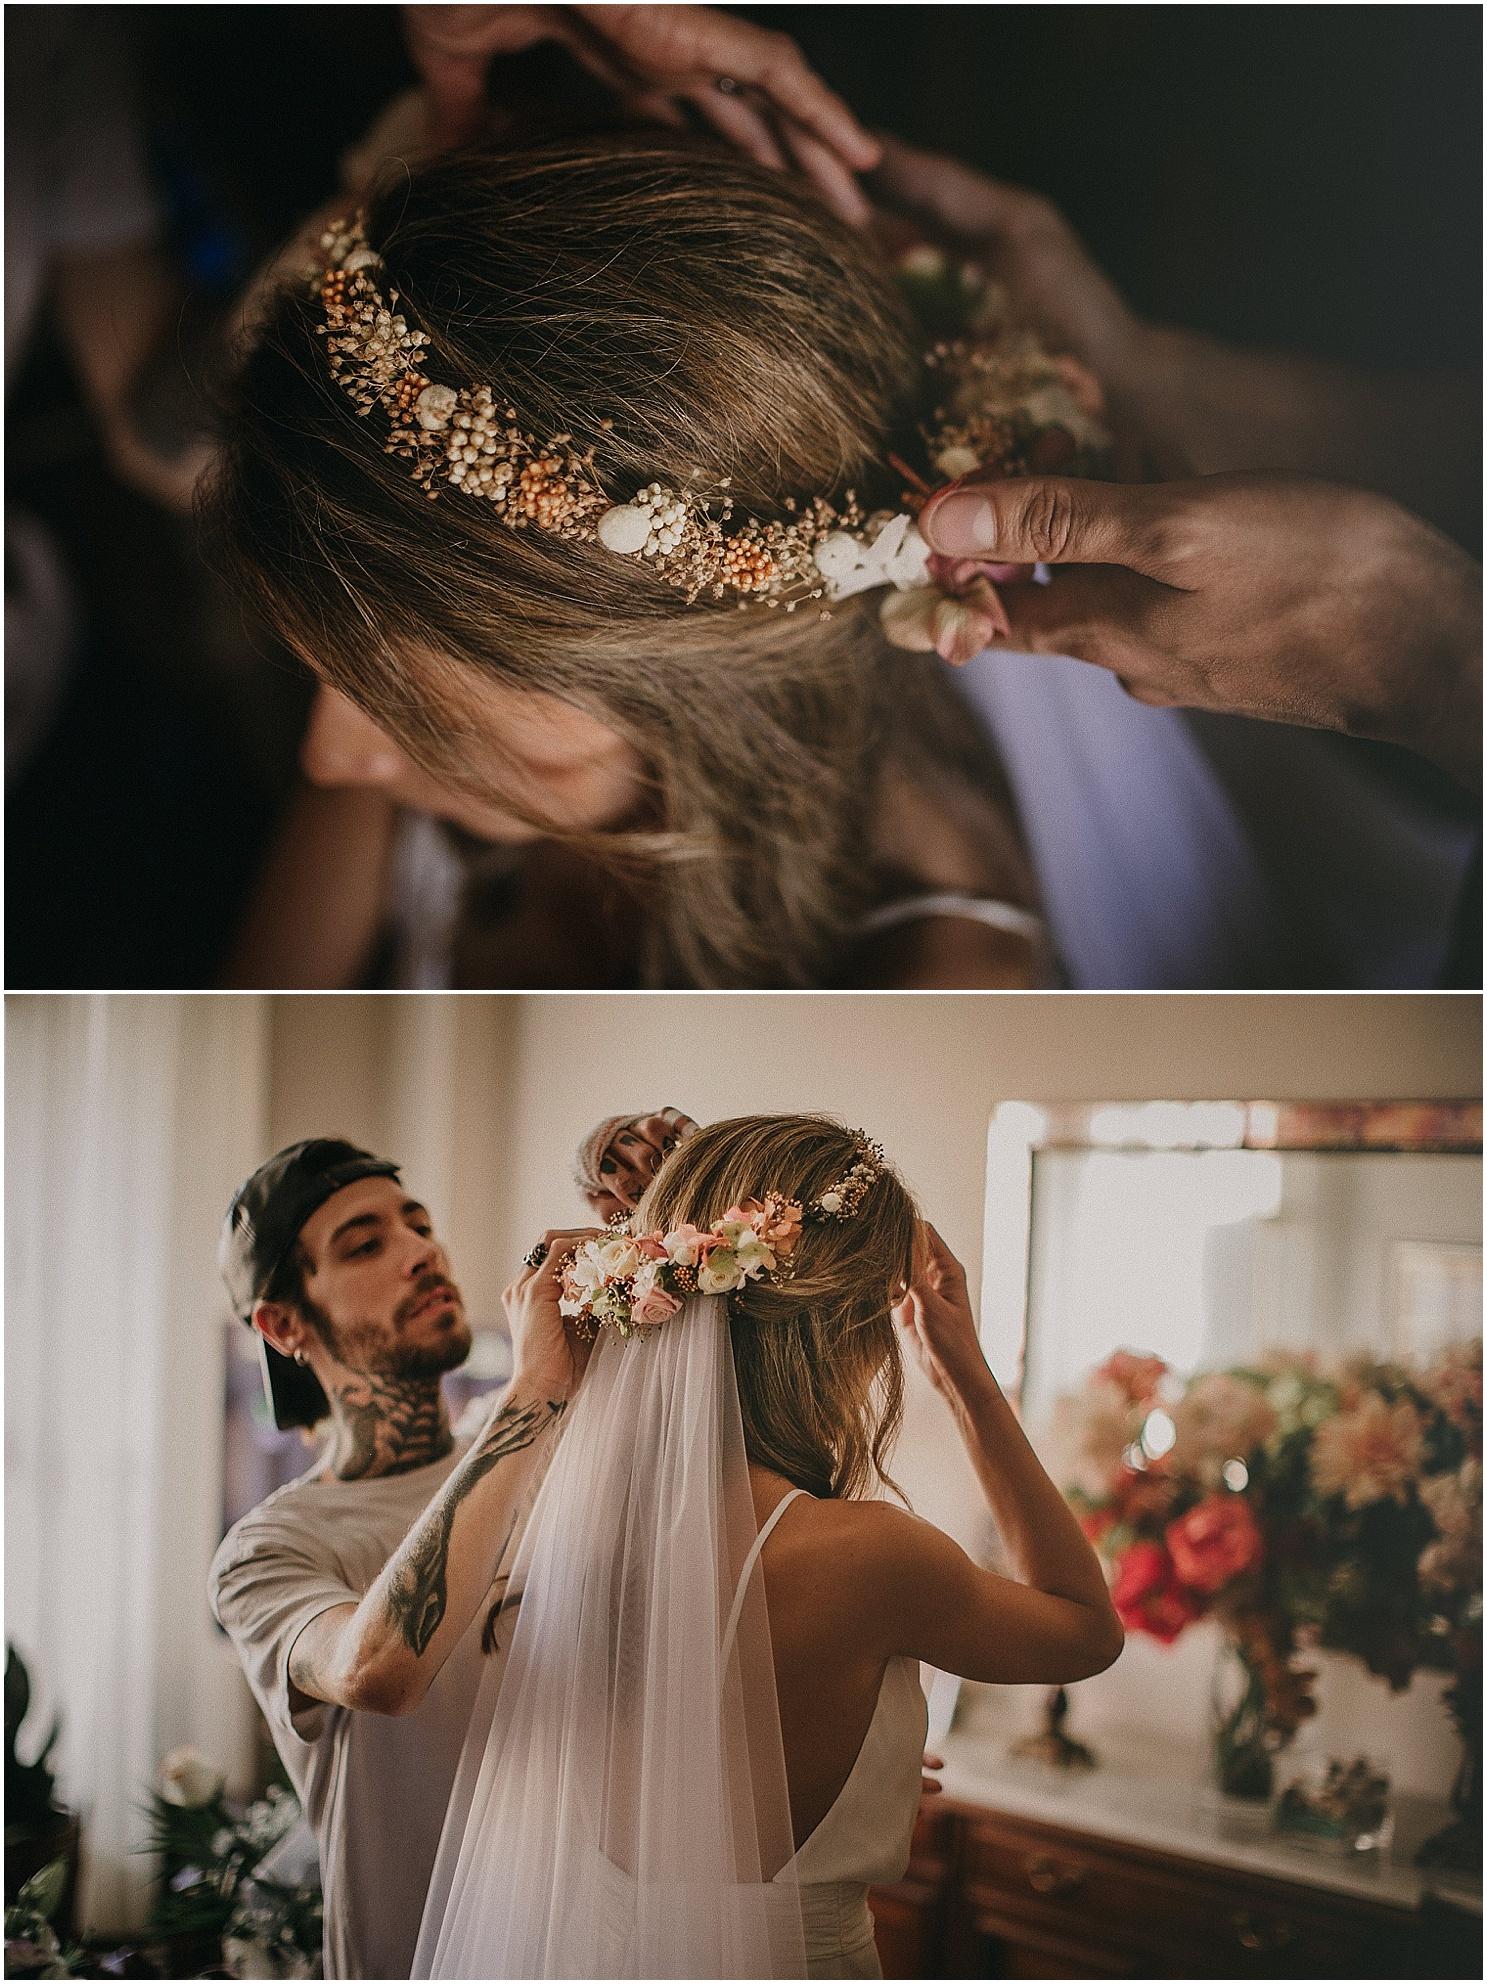 Macarena y Jordi - boda en valencia - Pablo Laguia (4).jpg